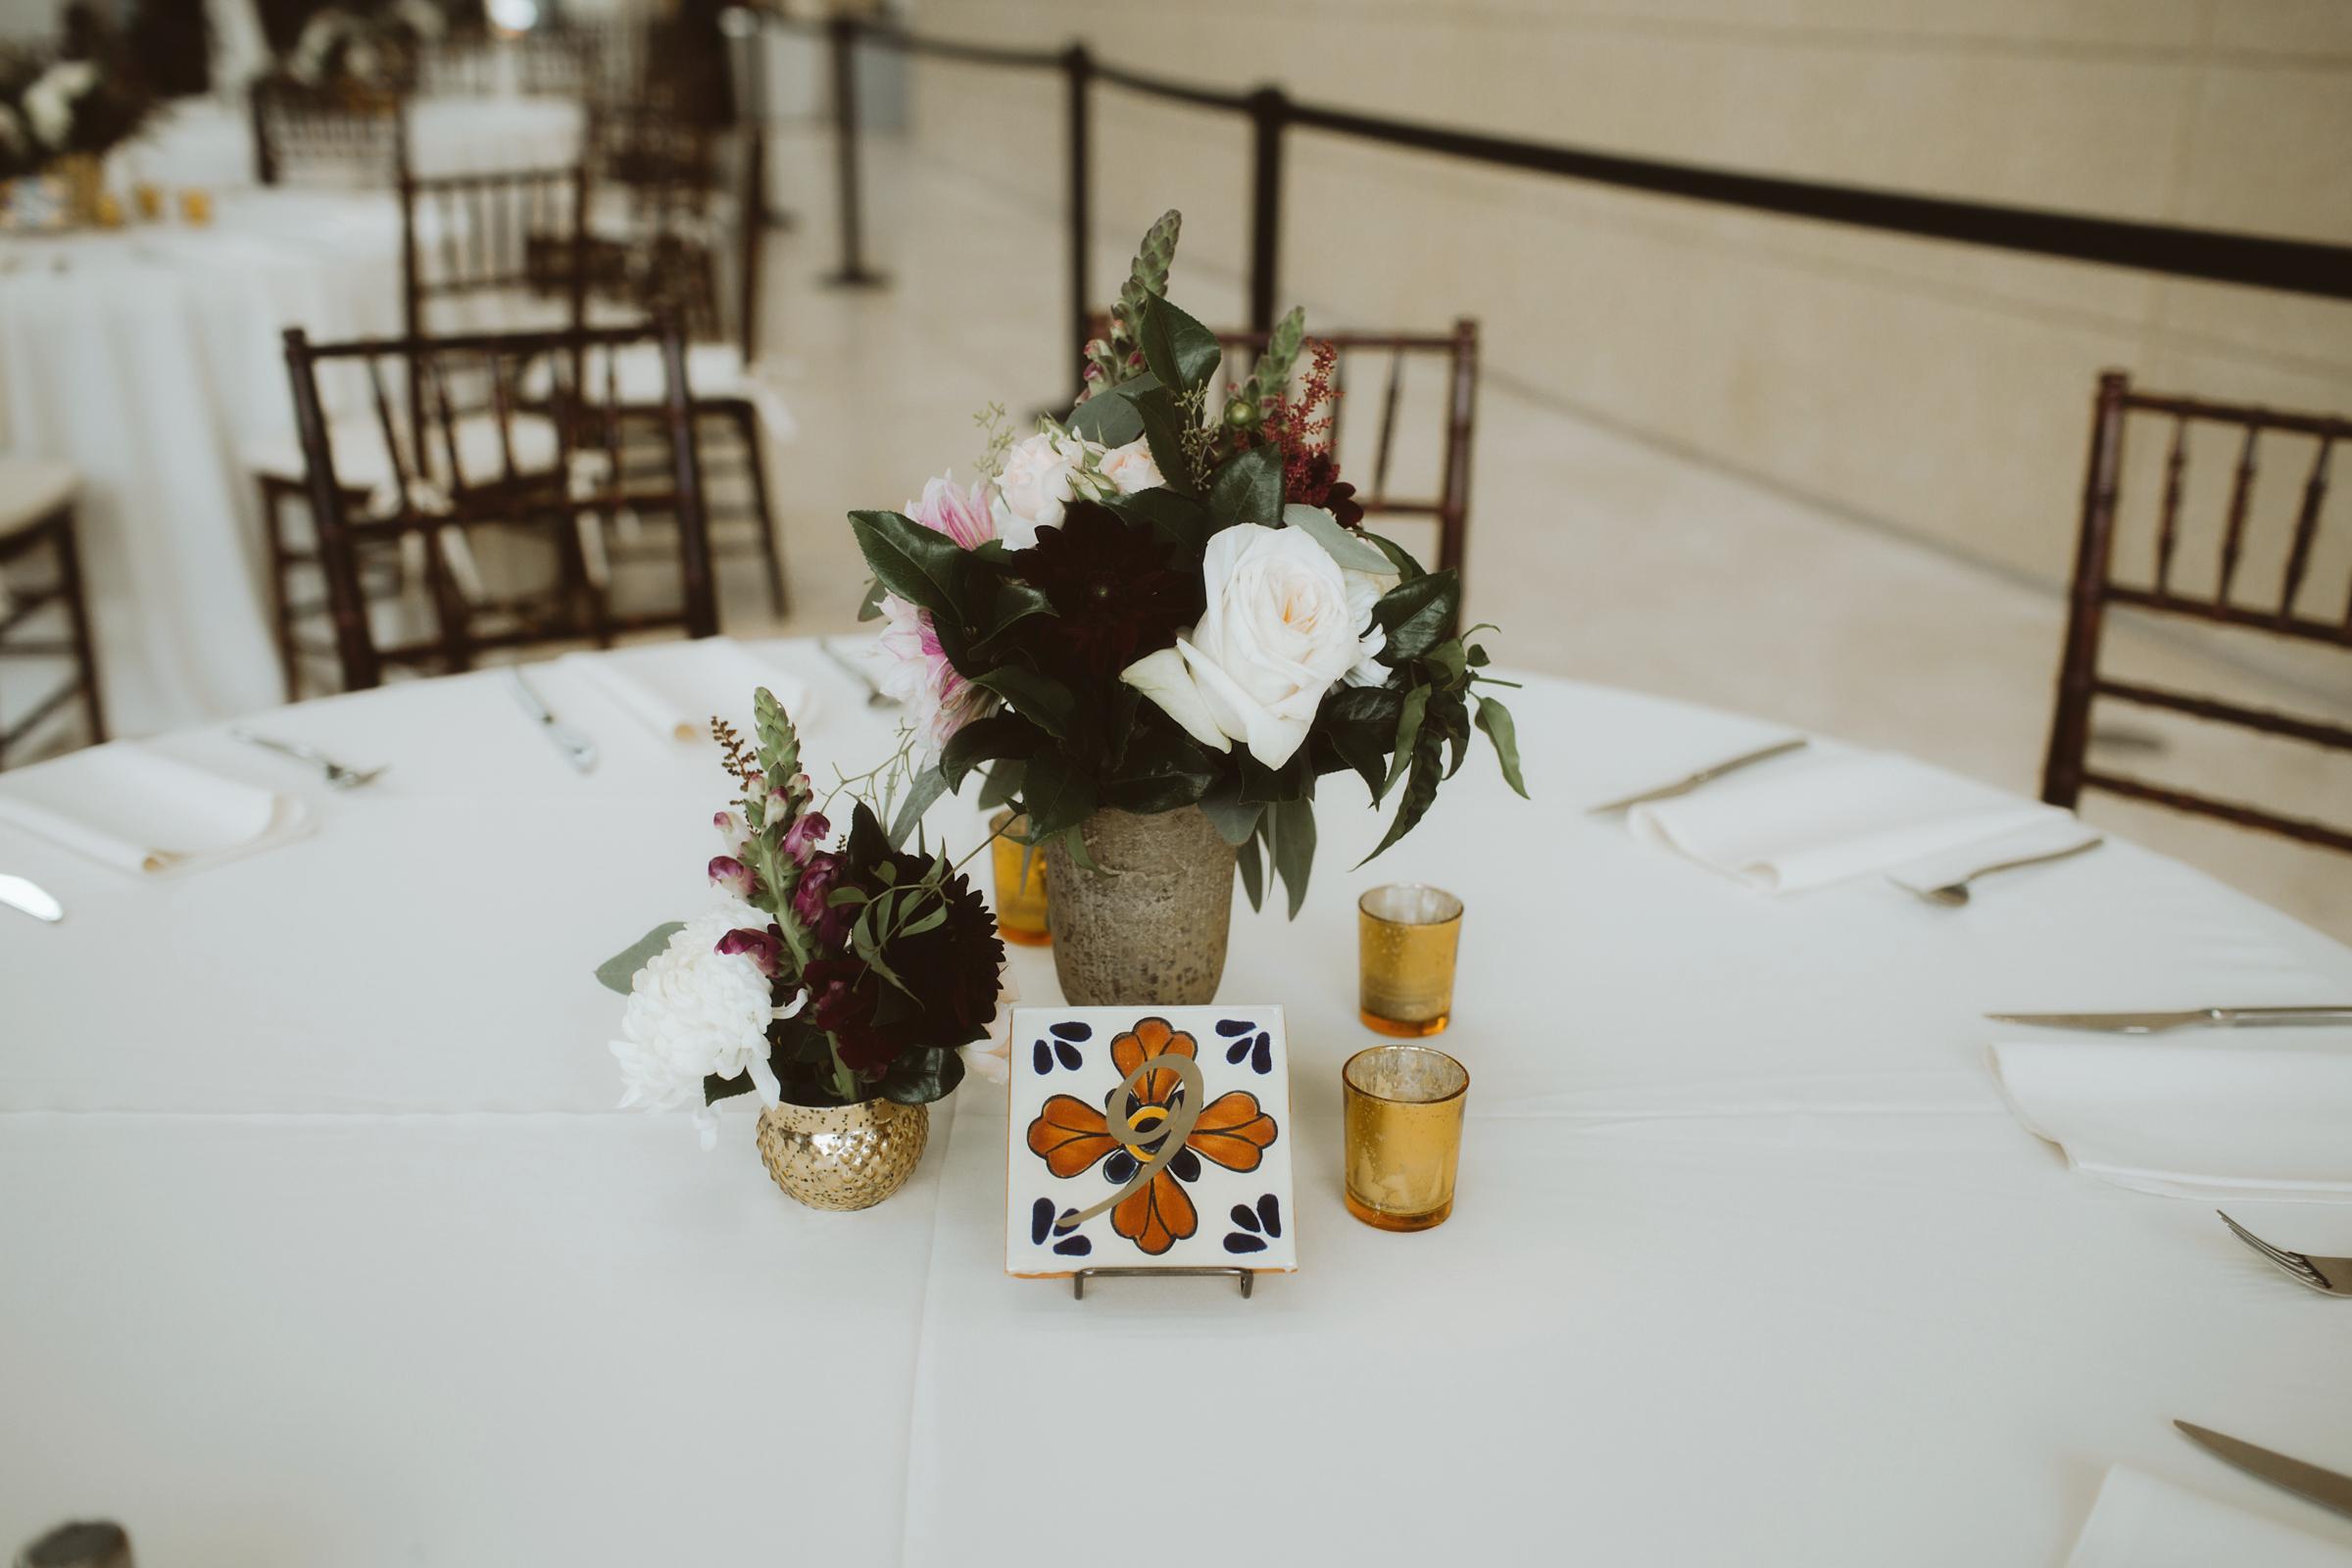 wedding day | MFA St Pete | Vanessa Boy Photography | vanessaboy.com-227.com |final.jpg